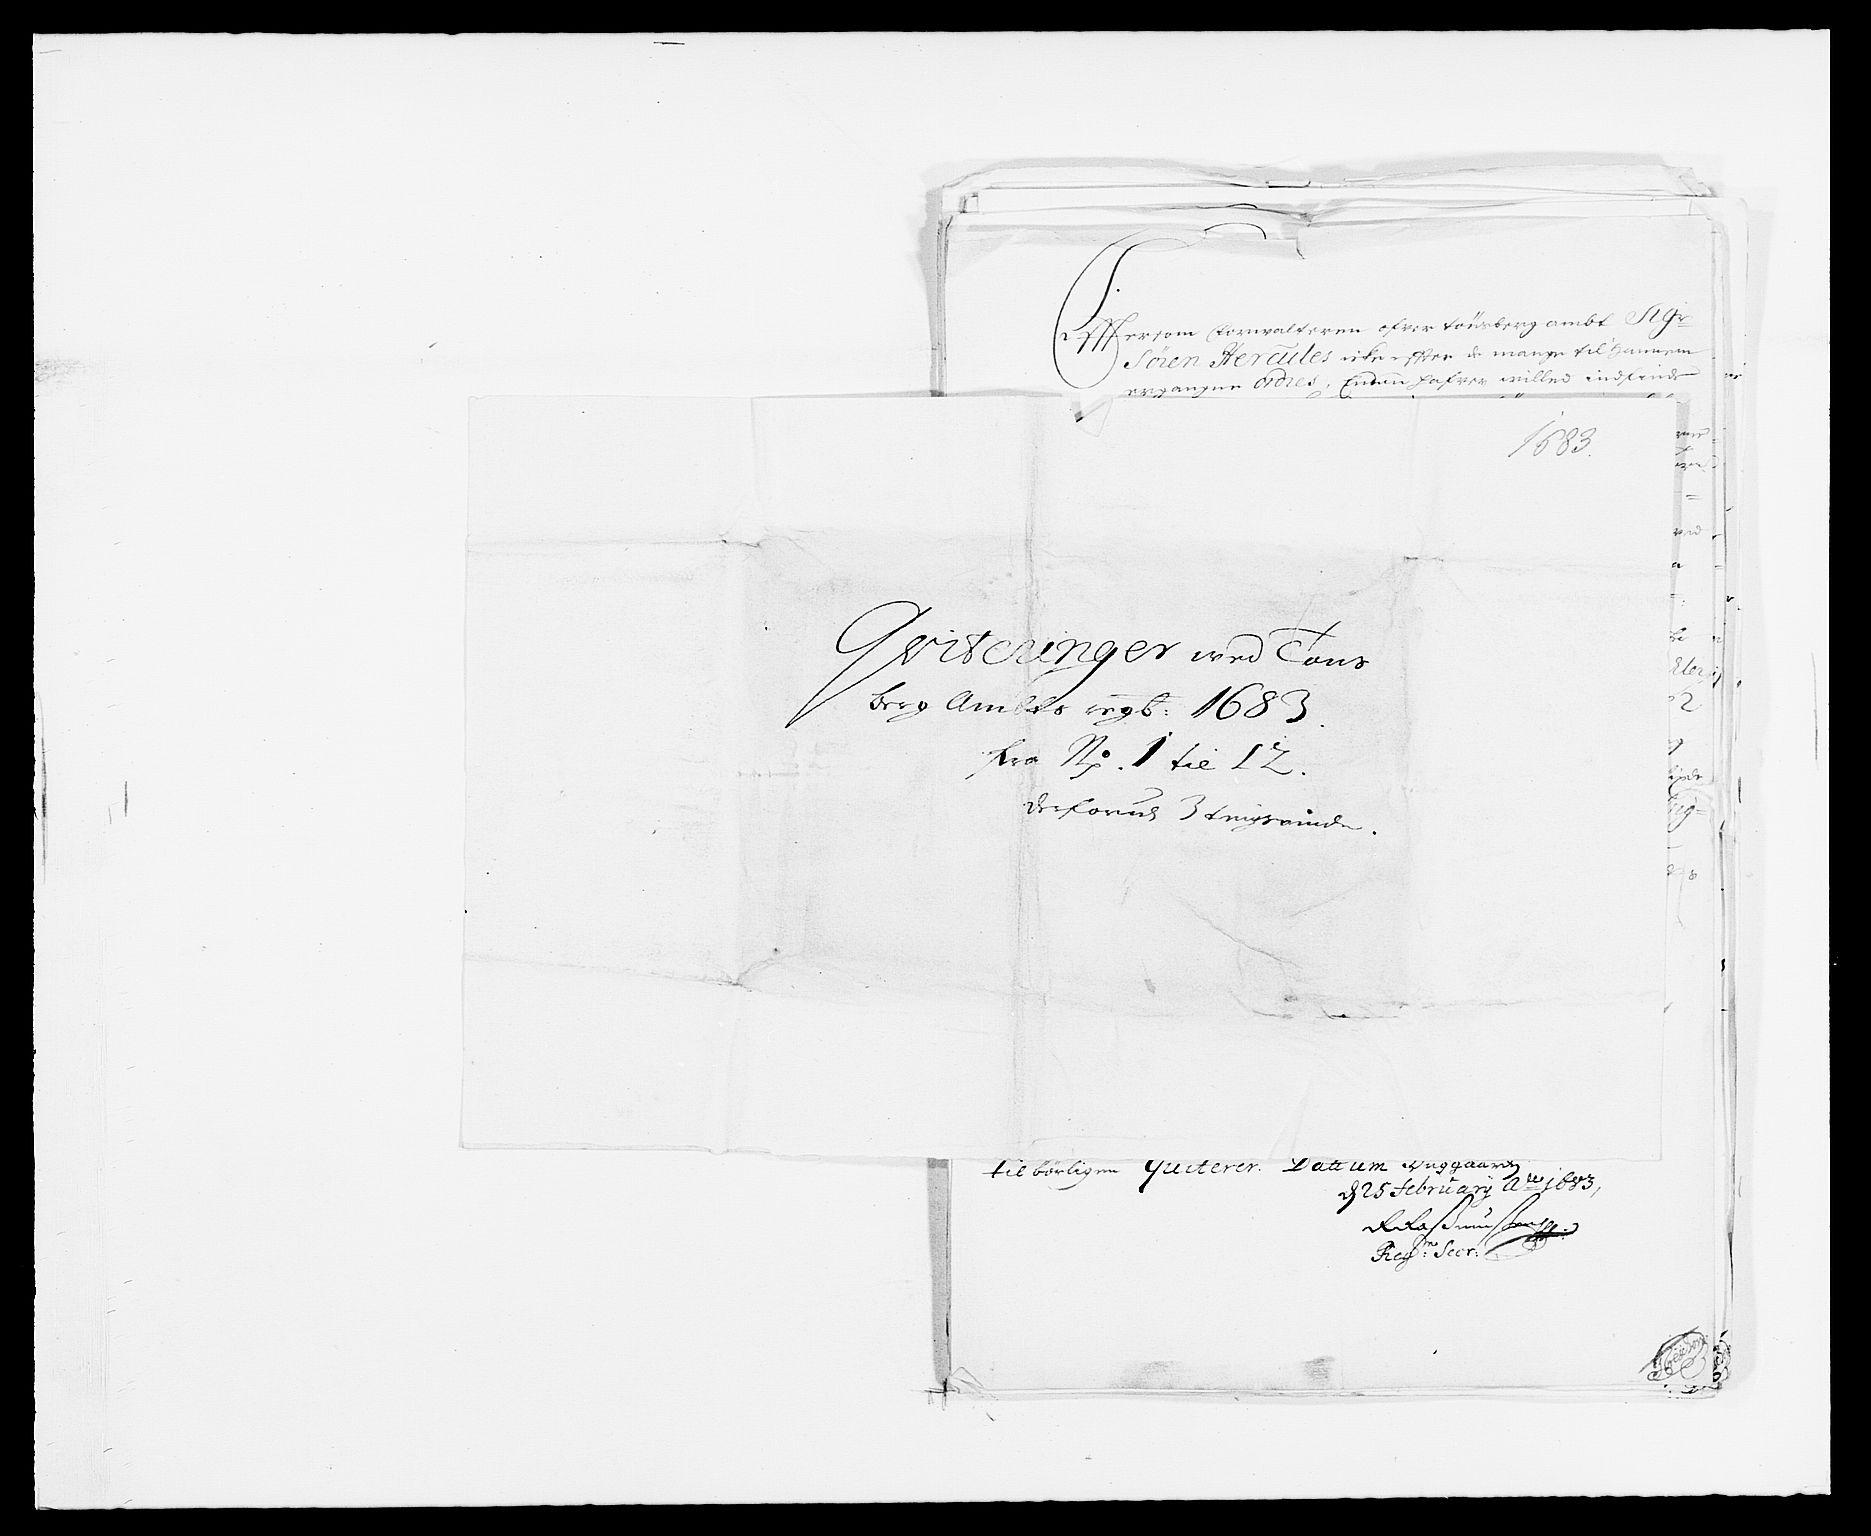 RA, Rentekammeret inntil 1814, Reviderte regnskaper, Fogderegnskap, R32/L1853: Fogderegnskap Jarlsberg grevskap, 1683, s. 169